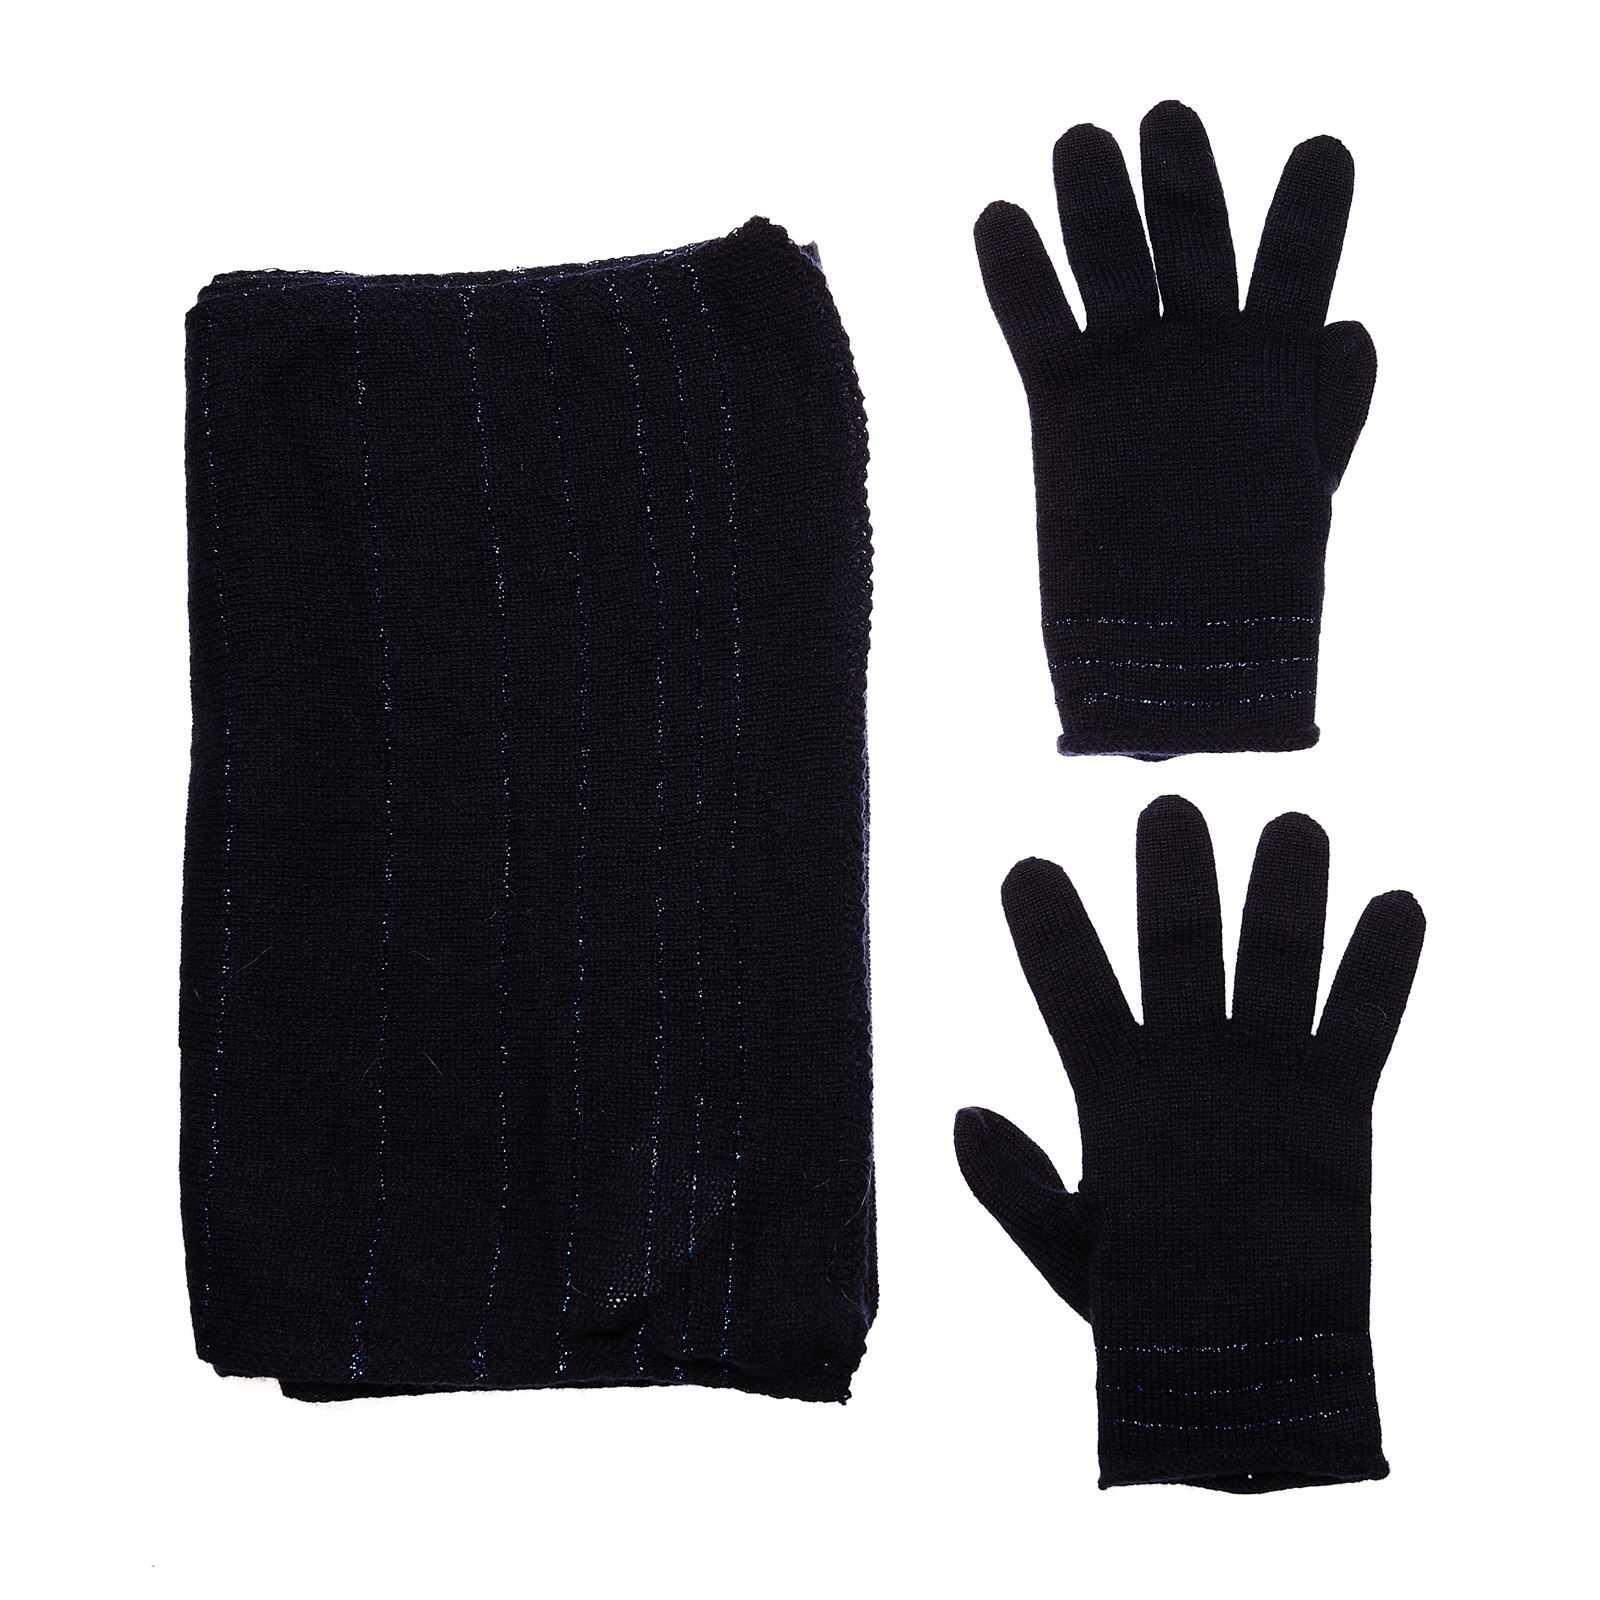 Echarpe et gants en cachemire